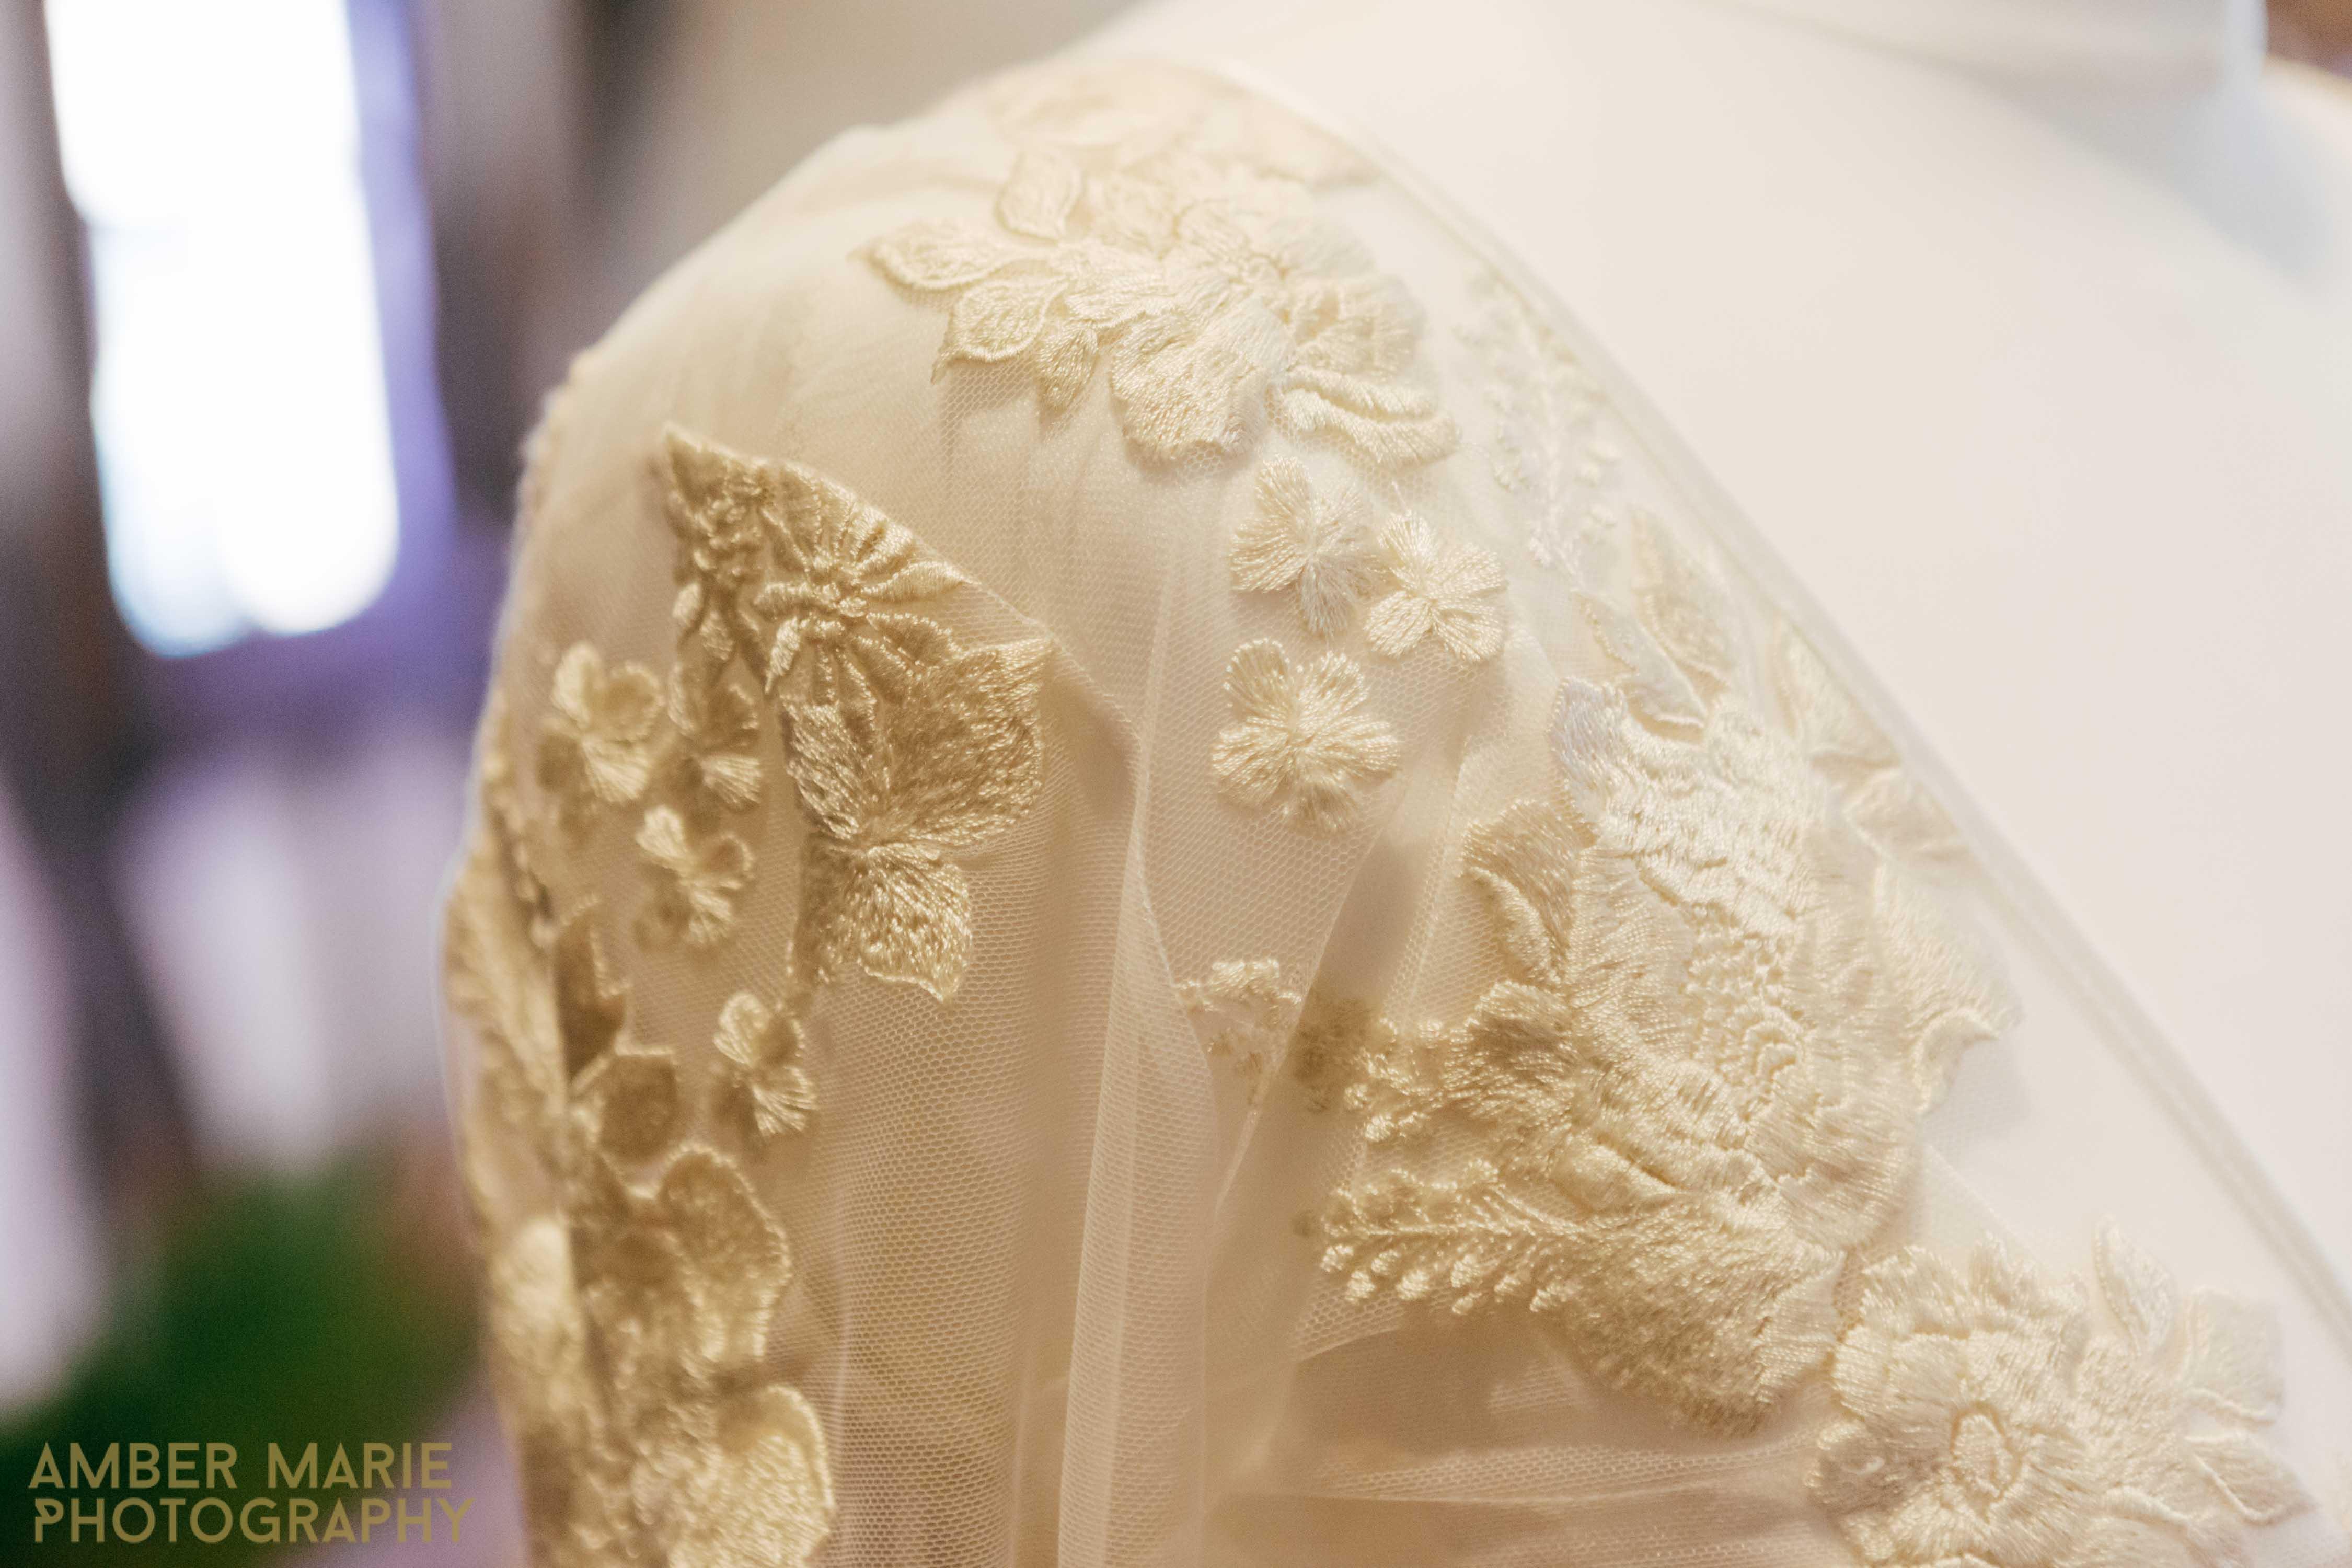 Creative quirky wedding photographers leeds yorkshire